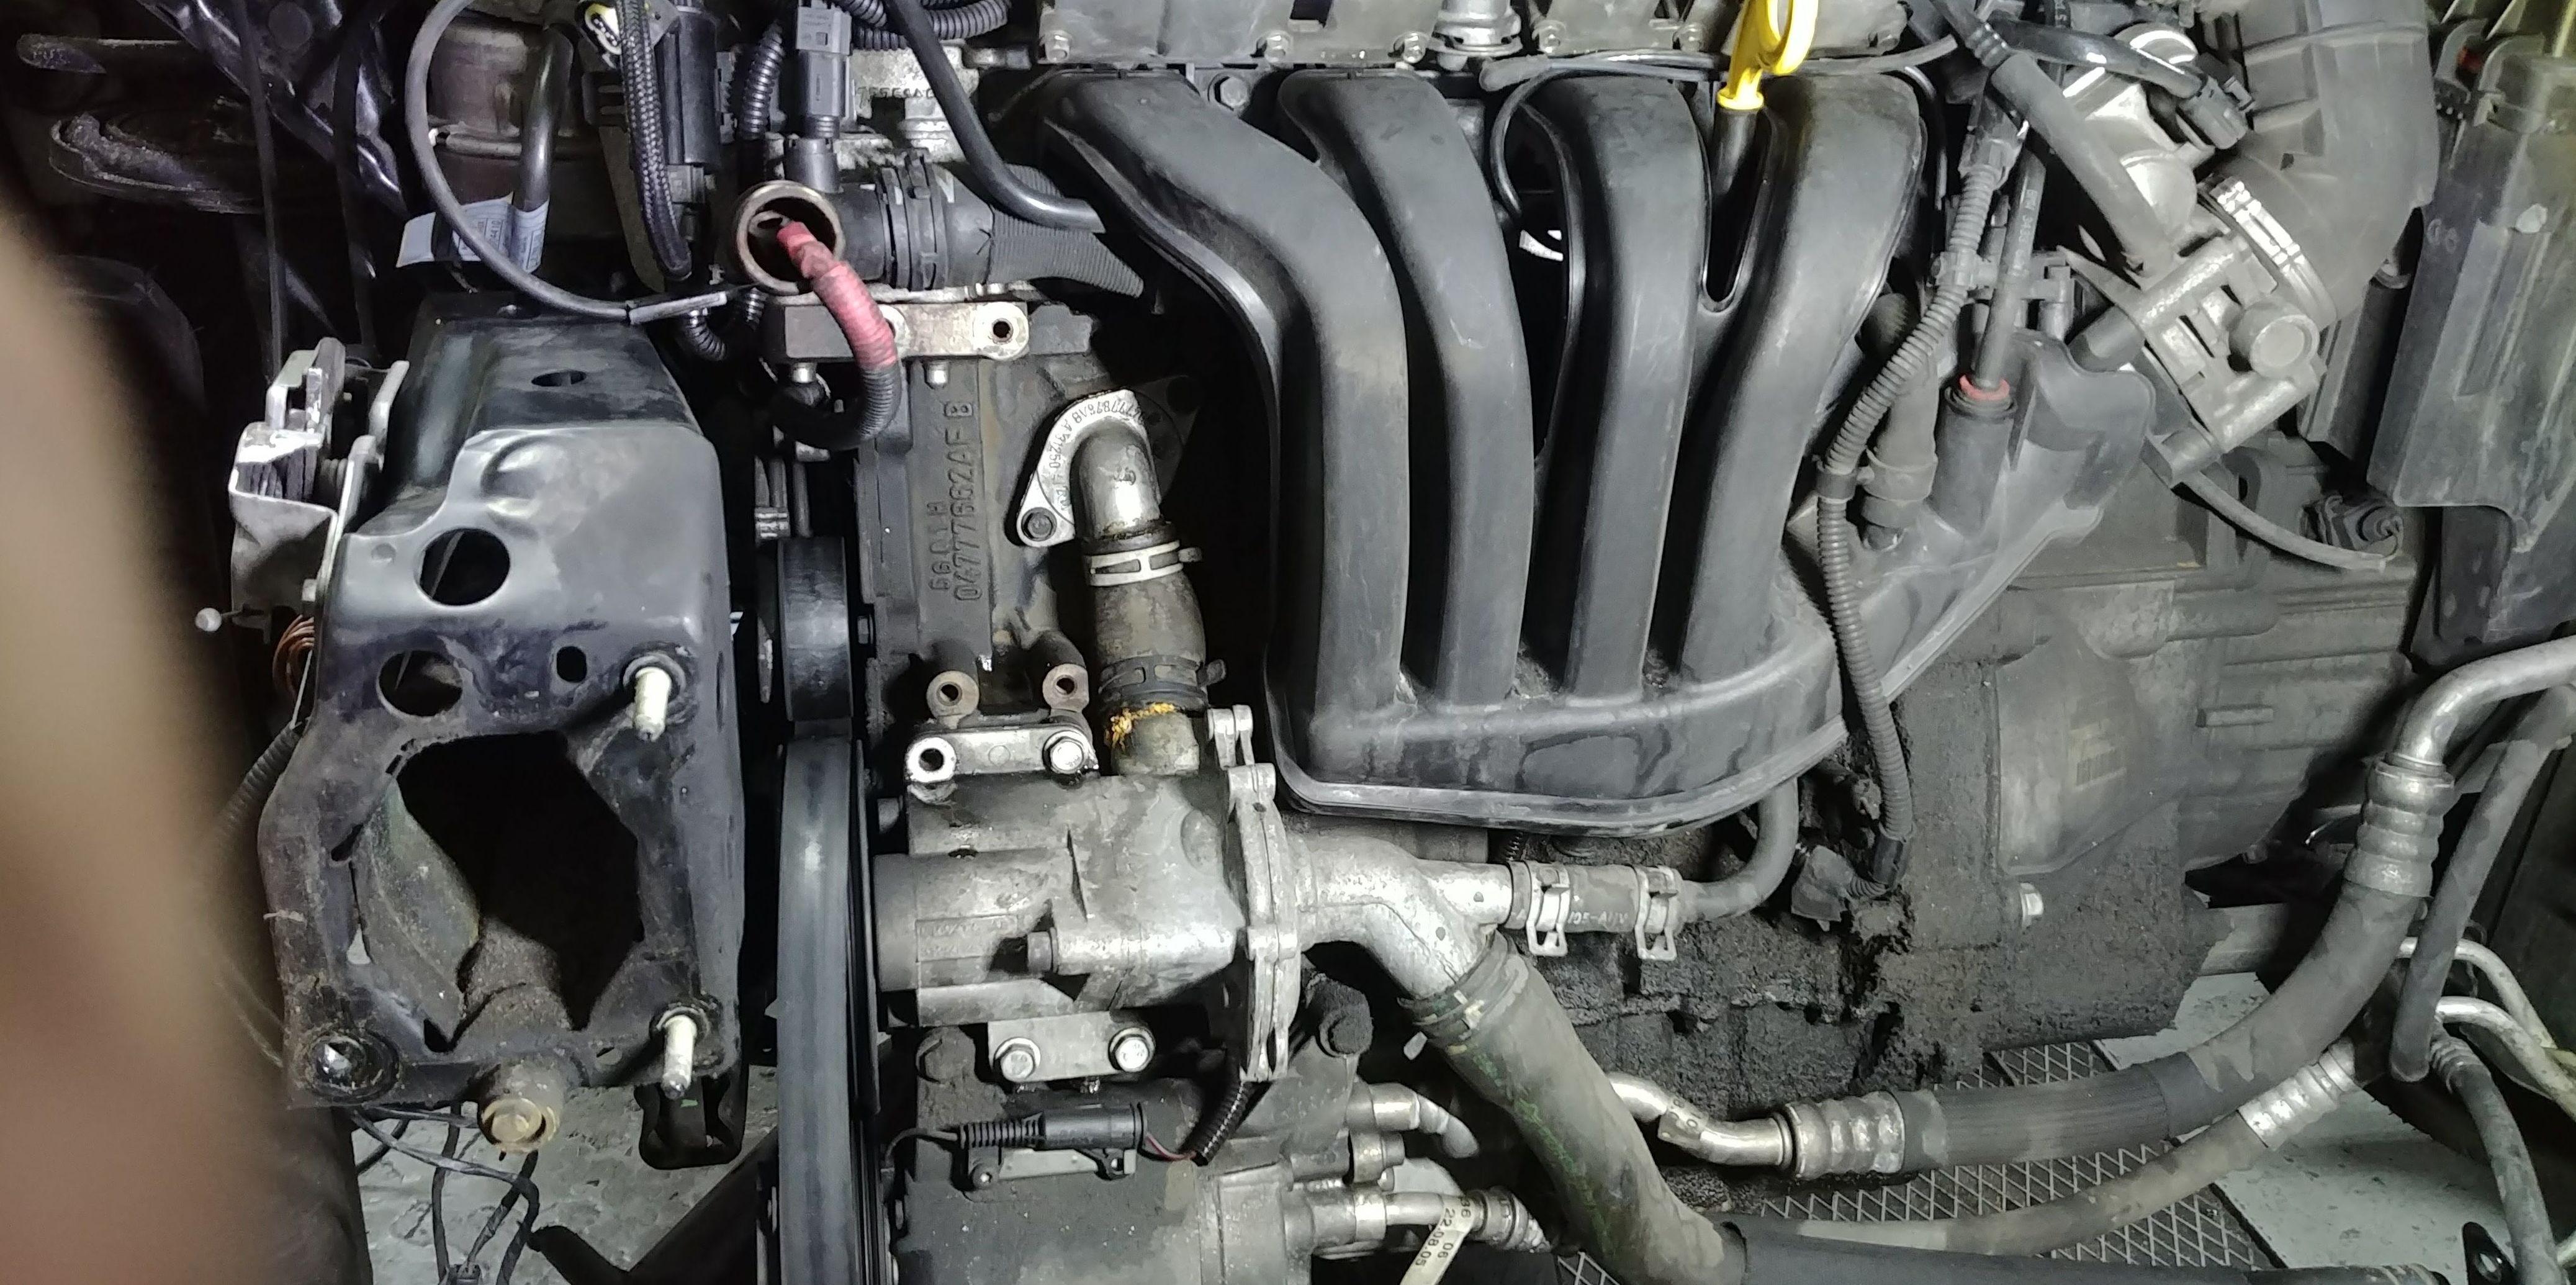 Control de fugas de circuito de refrigeración: Servicios de Talleres LGA